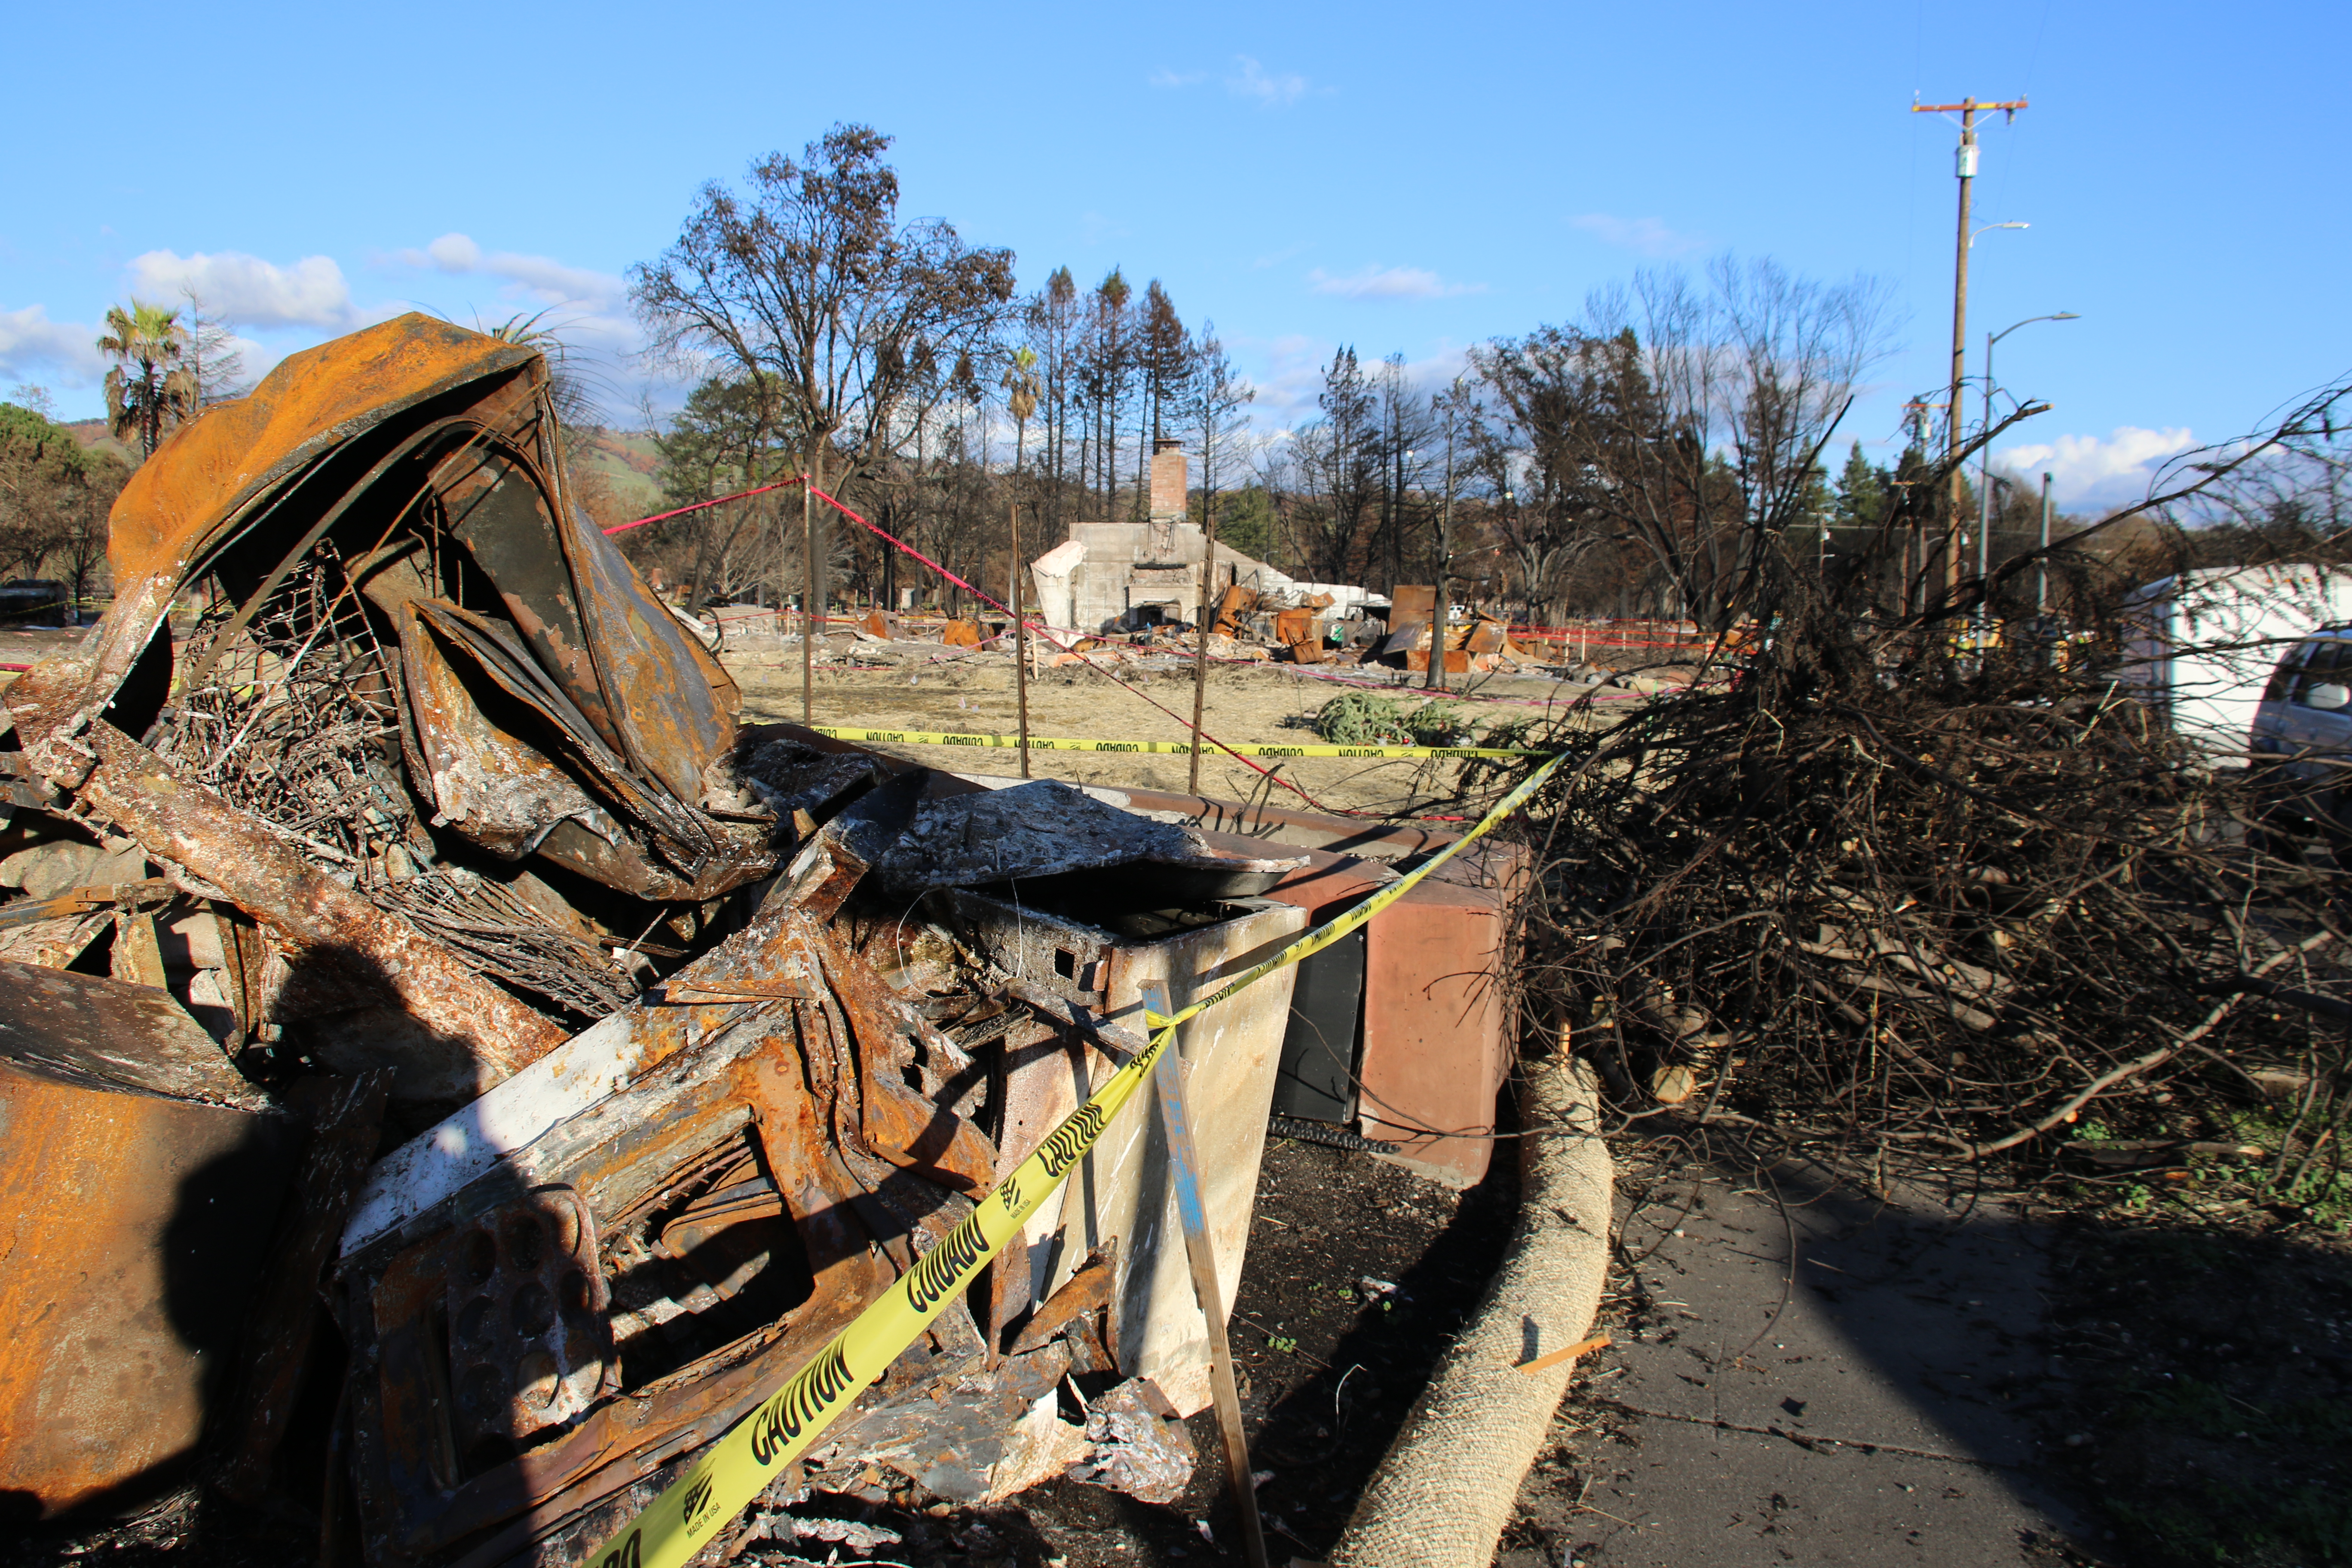 (38687921415).jpg SANTA ROSA, California - U.S. Army Corps of Engineers contractors continue to remove debris in Coffey Park neighborhood within Santa Rosa